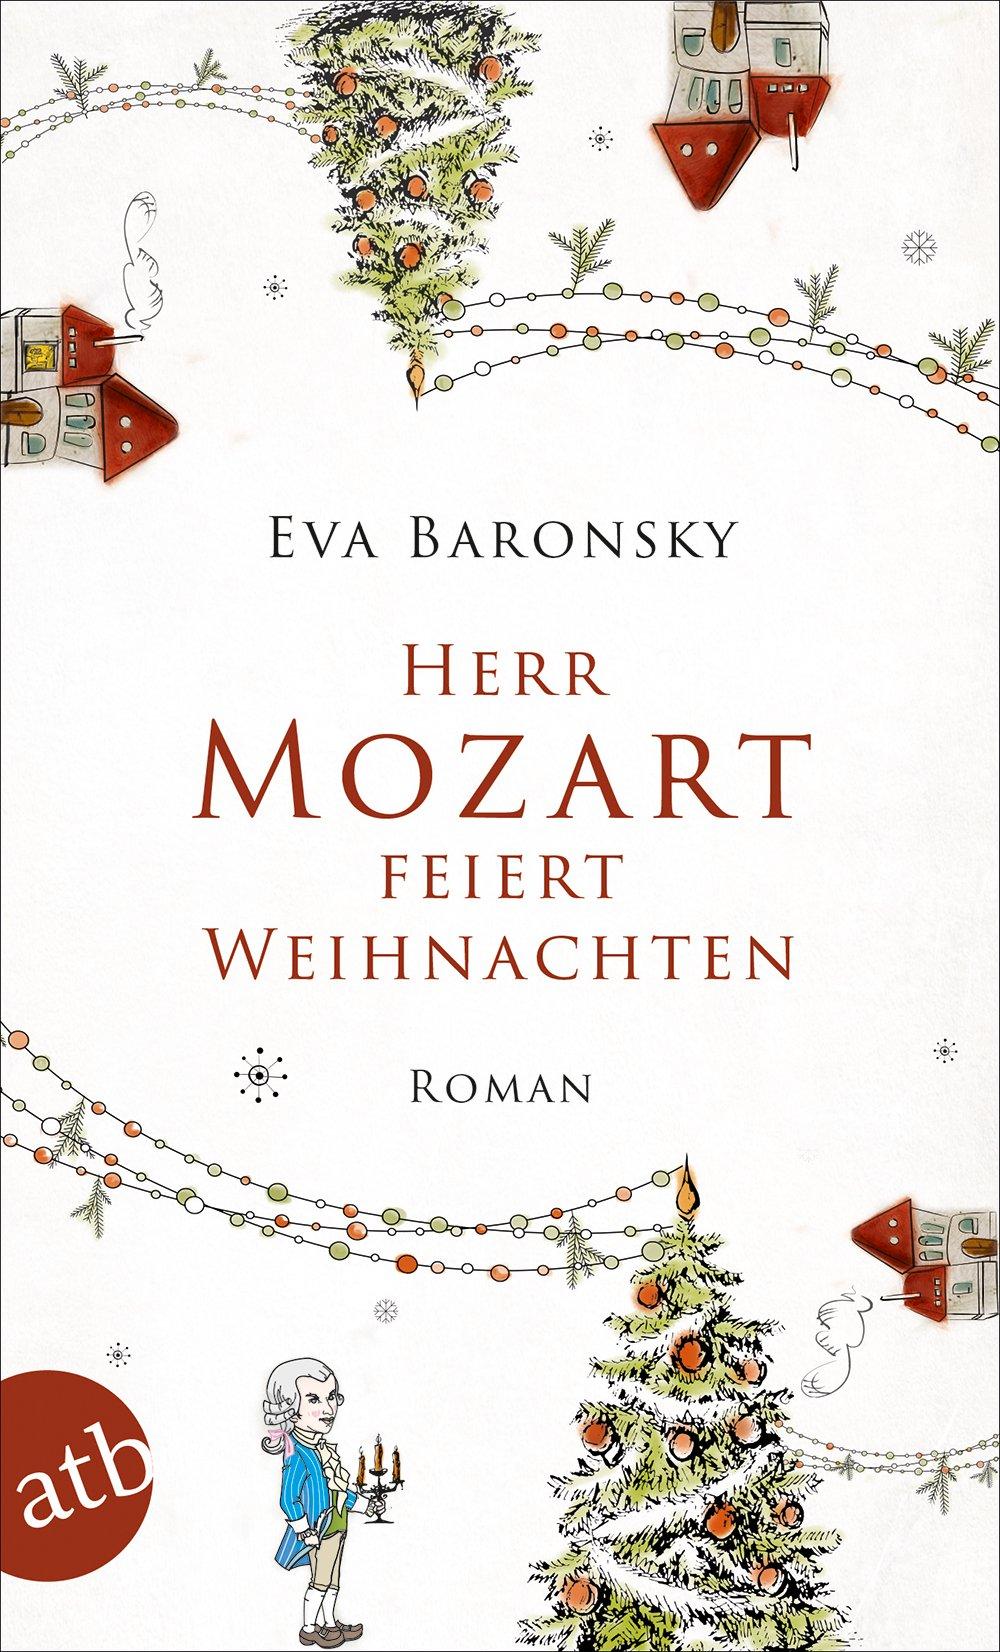 Herr Mozart feiert Weihnachten: Roman: Amazon.de: Eva Baronsky: Bücher